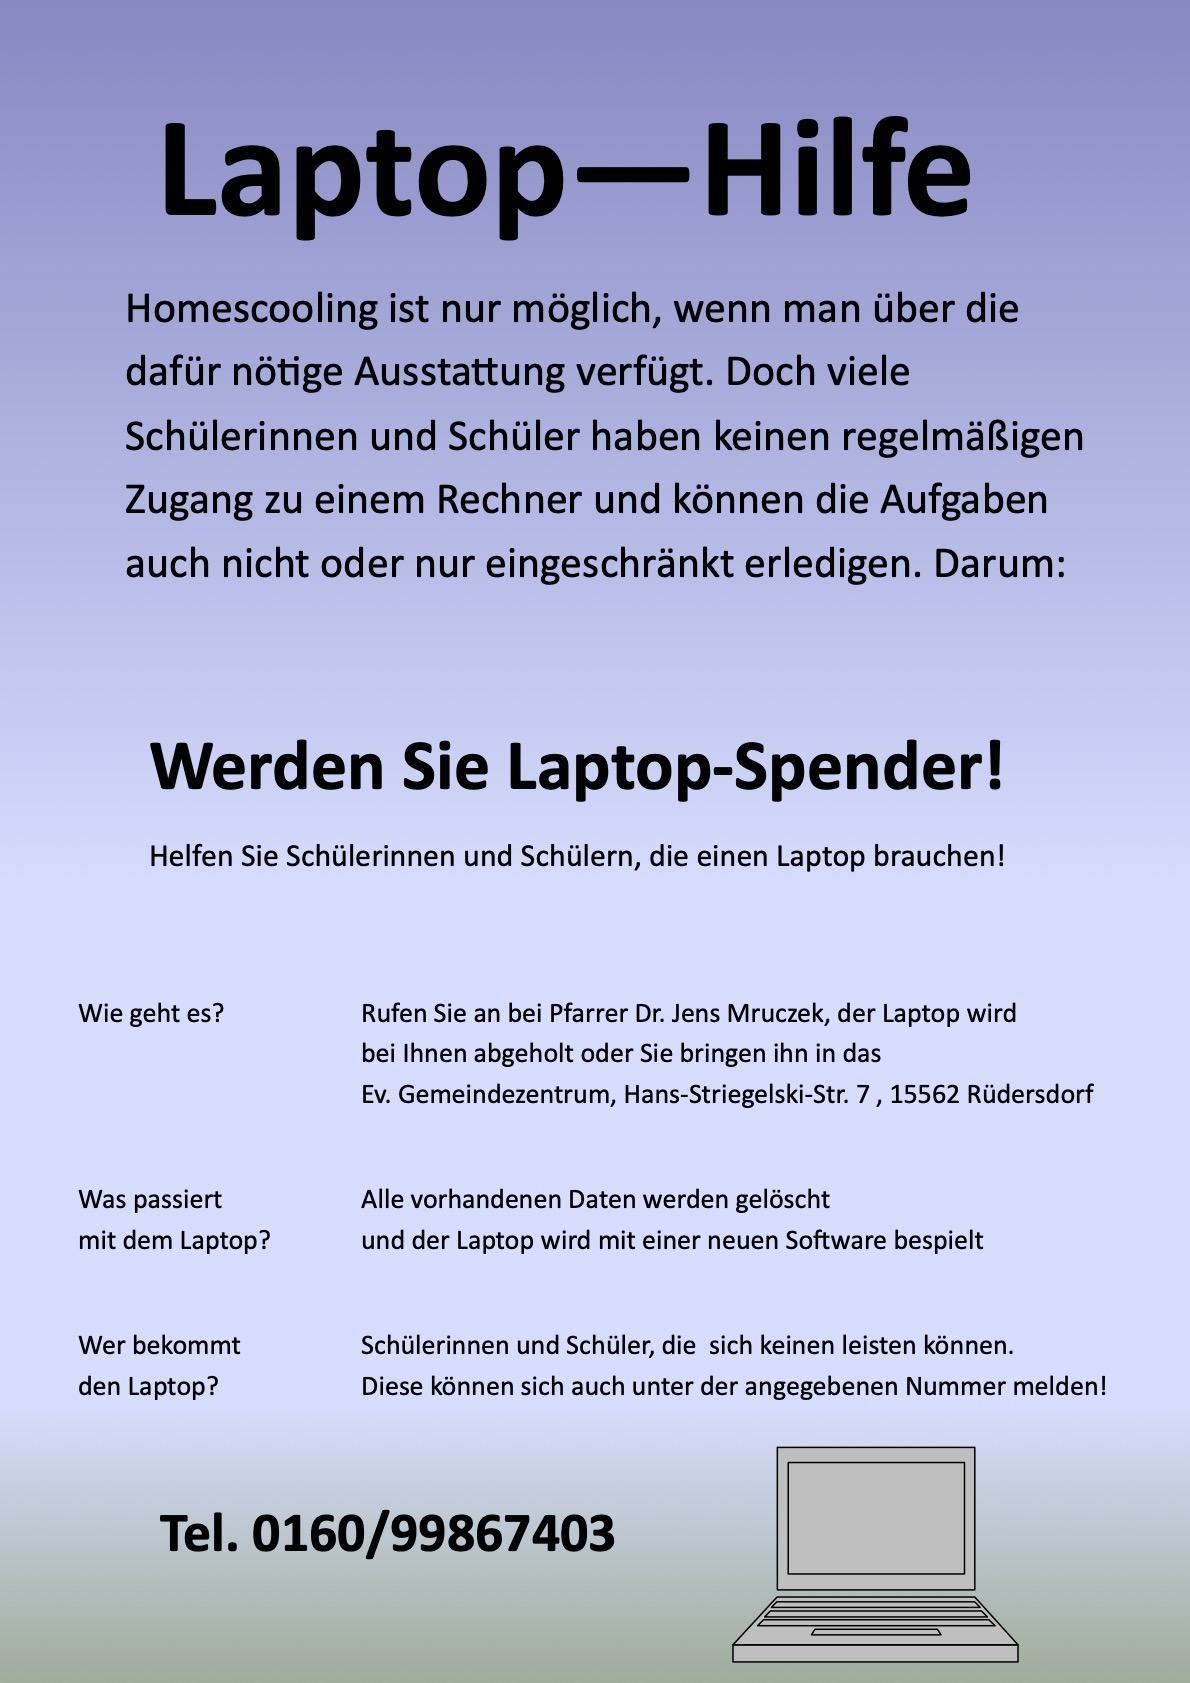 Laptop-Spende